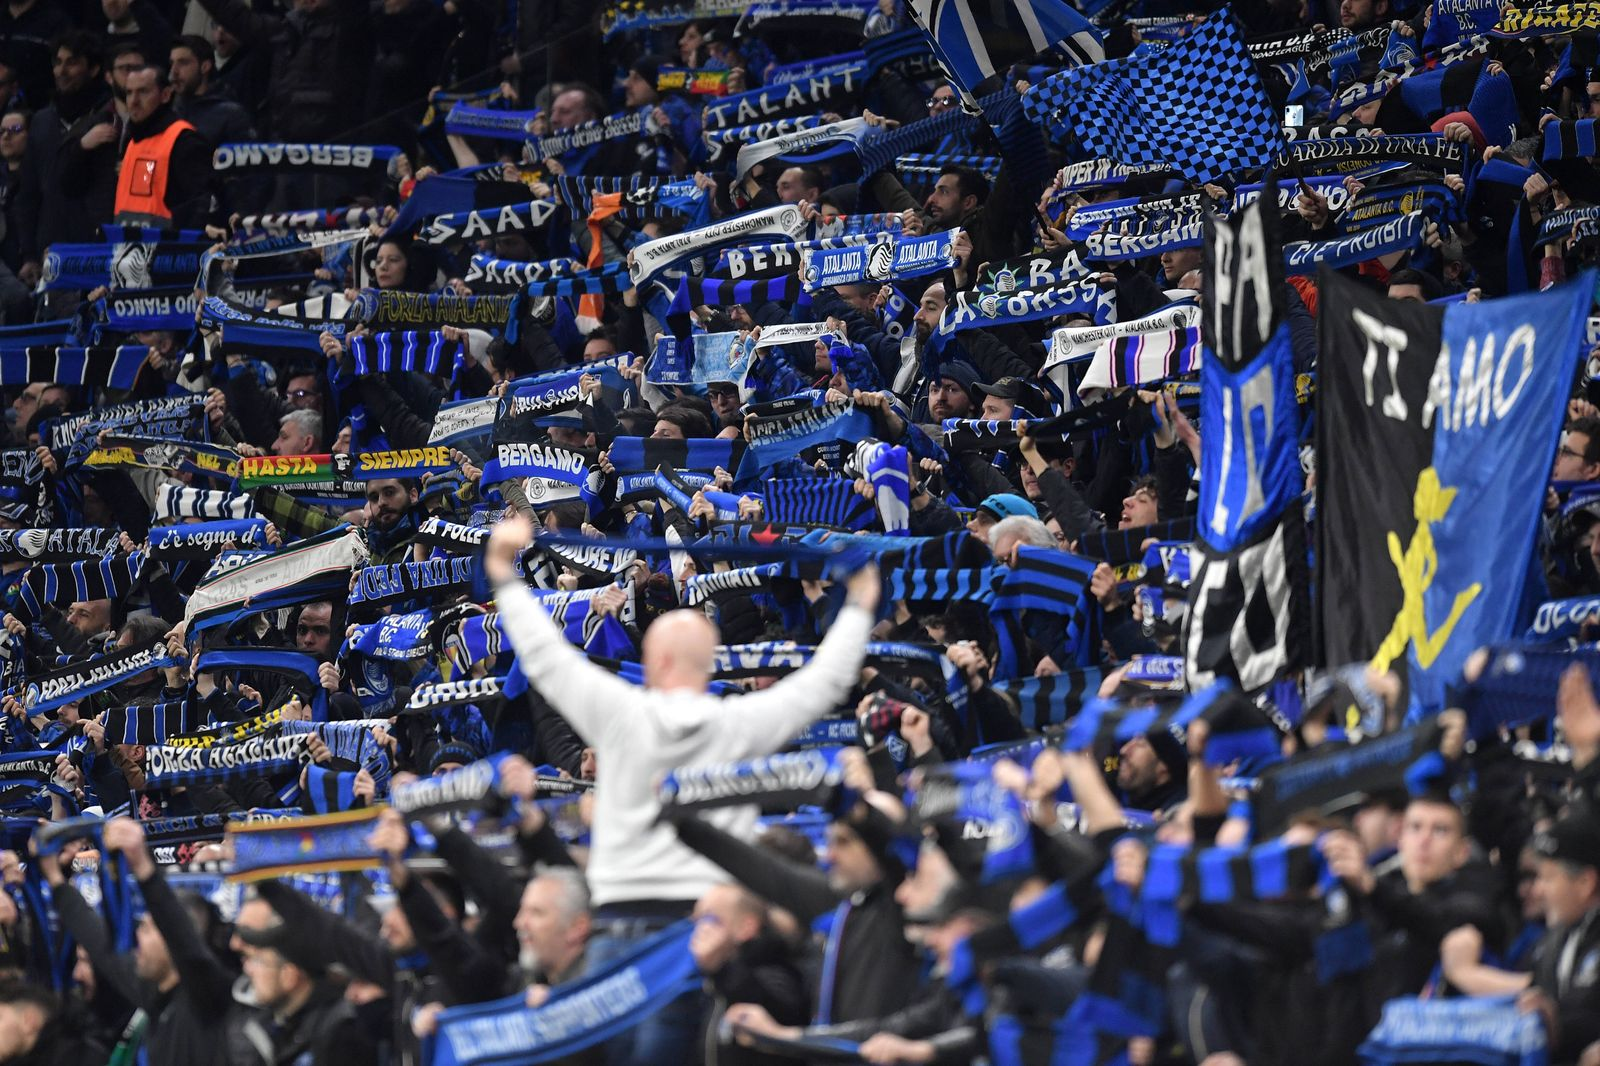 Atalanta fans cheer on Milano 19/02/2020 Stadio San Siro Football Champions League 2019/2020 Round of 16 1st leg Atalant